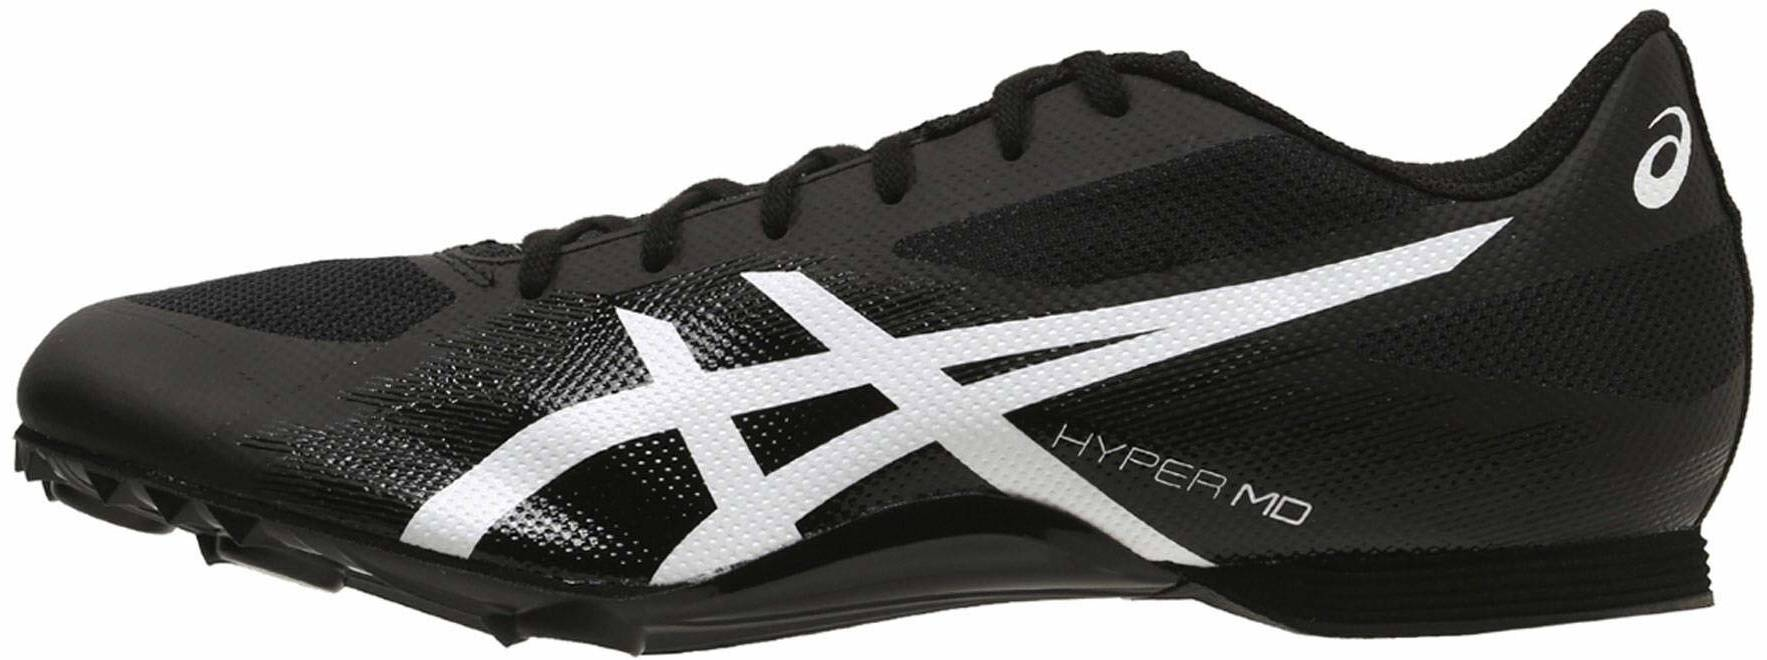 Asics Unisex Hyper LD 6 Running Spikes Traction Black Sports Breathable